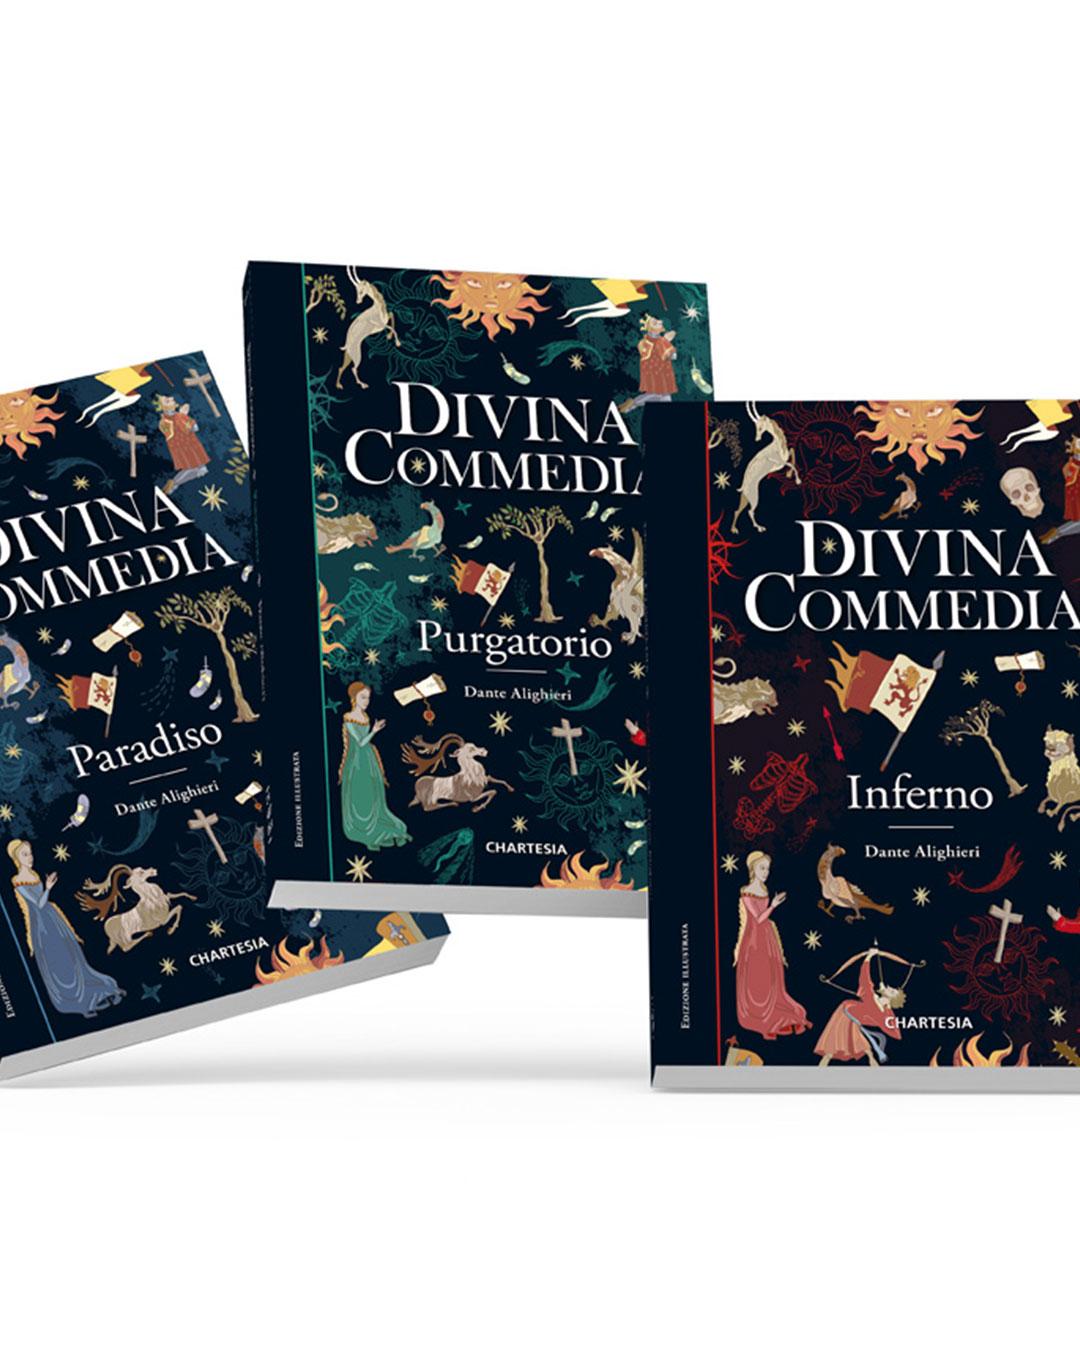 divina commedia illustrata diego gabriele 02 divina commedia illustrata